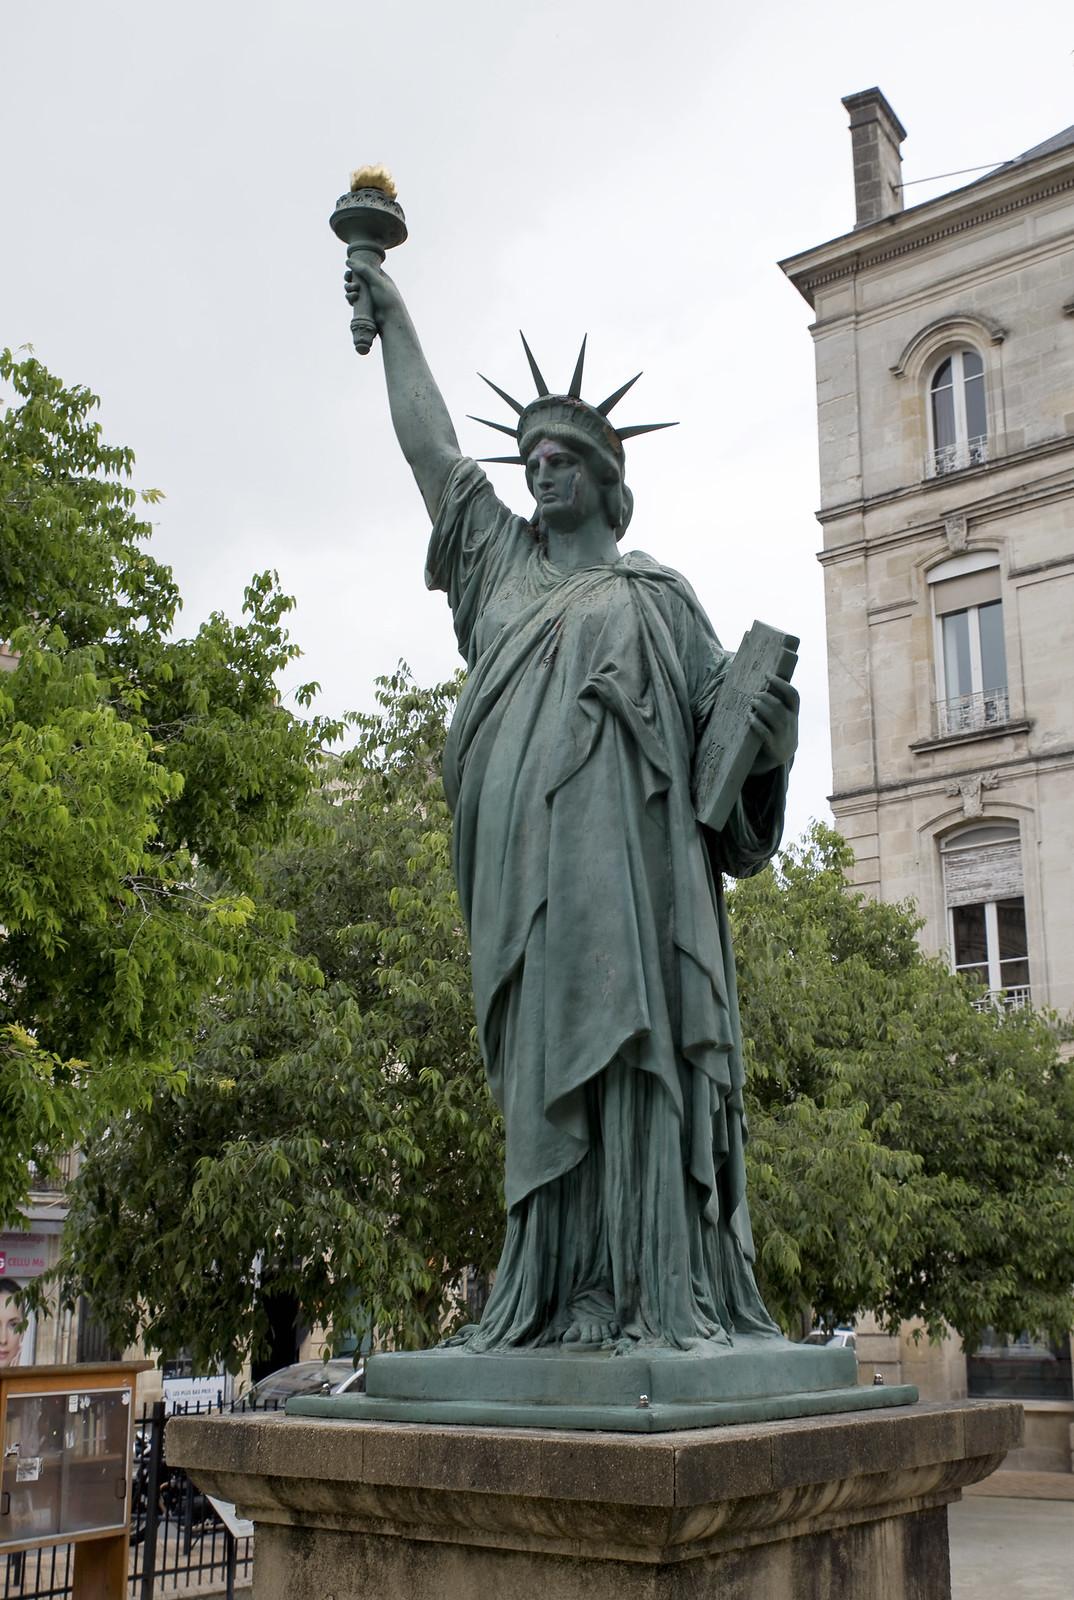 Bordeaux Statue of Liberty